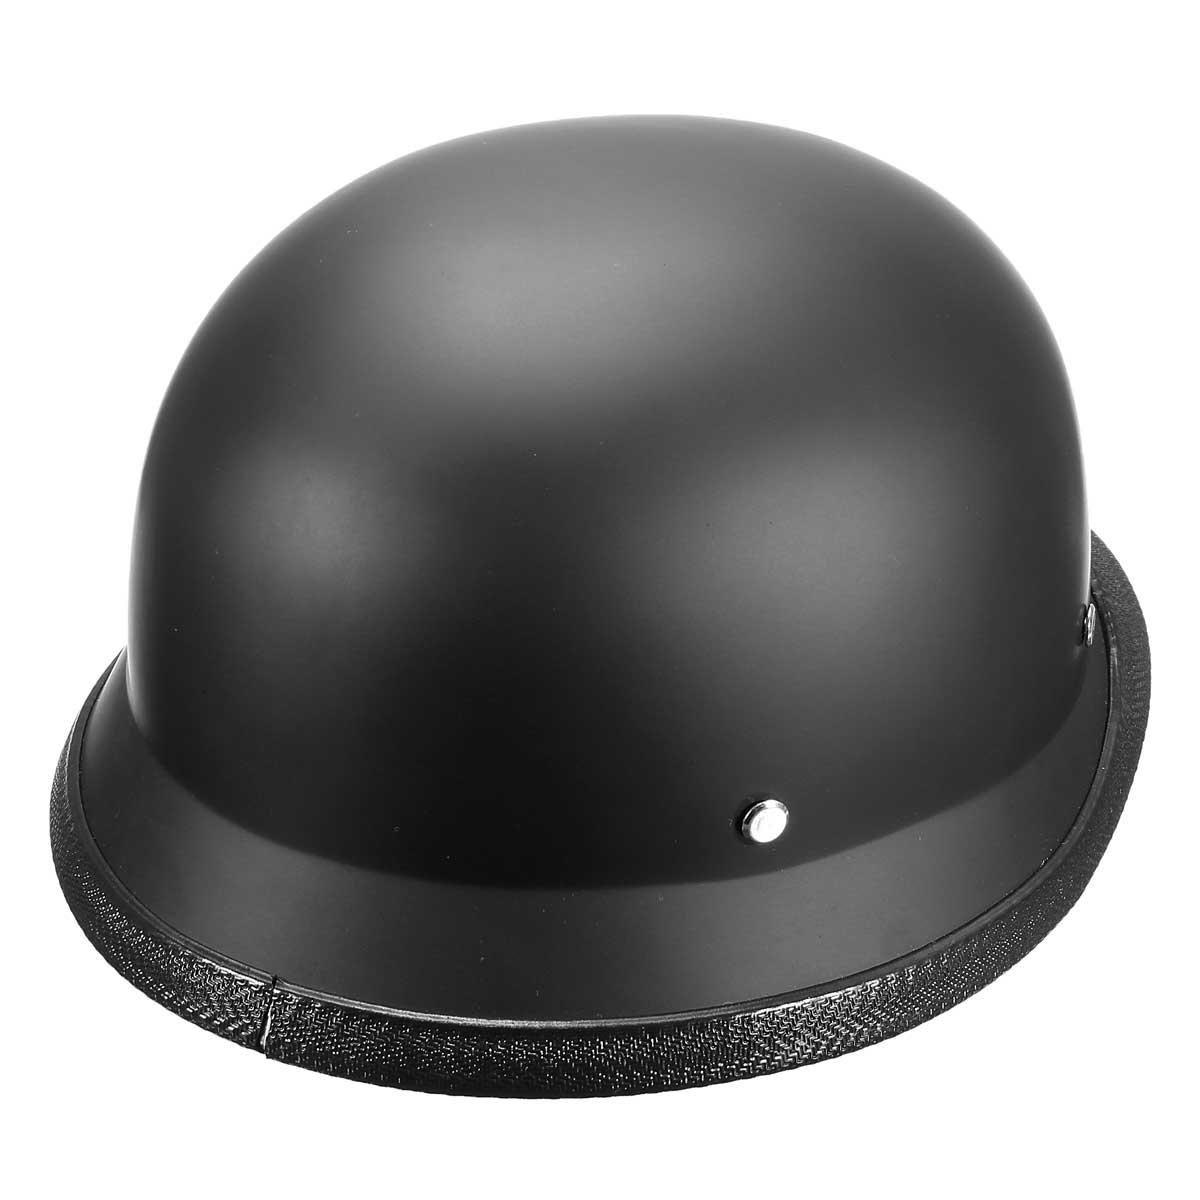 Abs Plastic Motorcycle Helmet Motorcross Capacete Half Helm Retro Matte Black In 2020 Helmet Motorcycle Helmets Matte Black